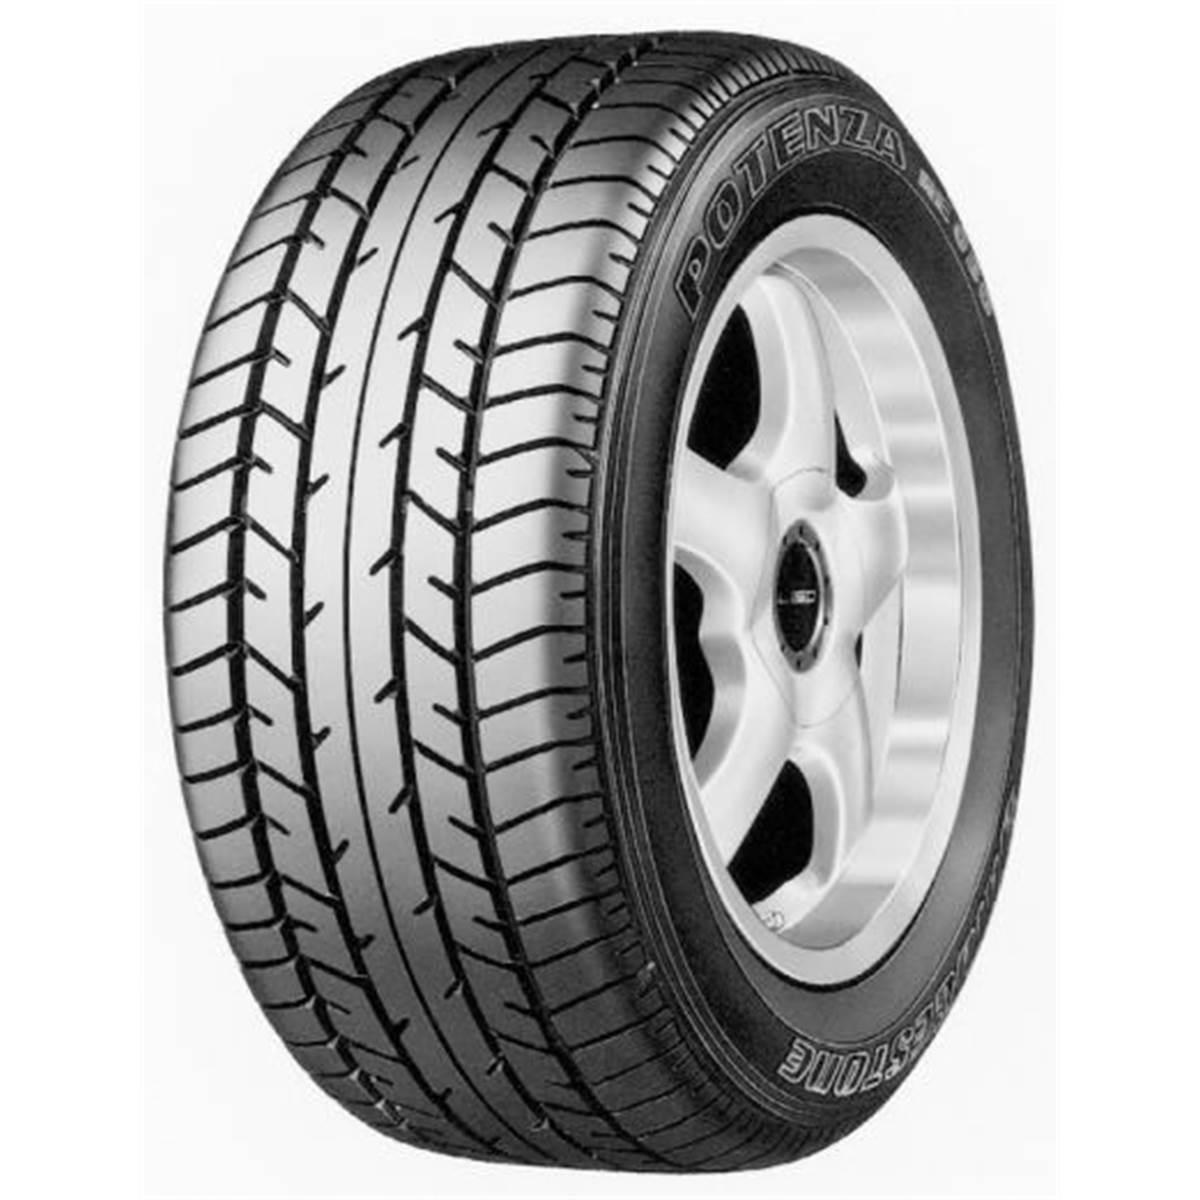 Pneu Runflat Bridgestone 255/40R20 97Y Potenza Re070